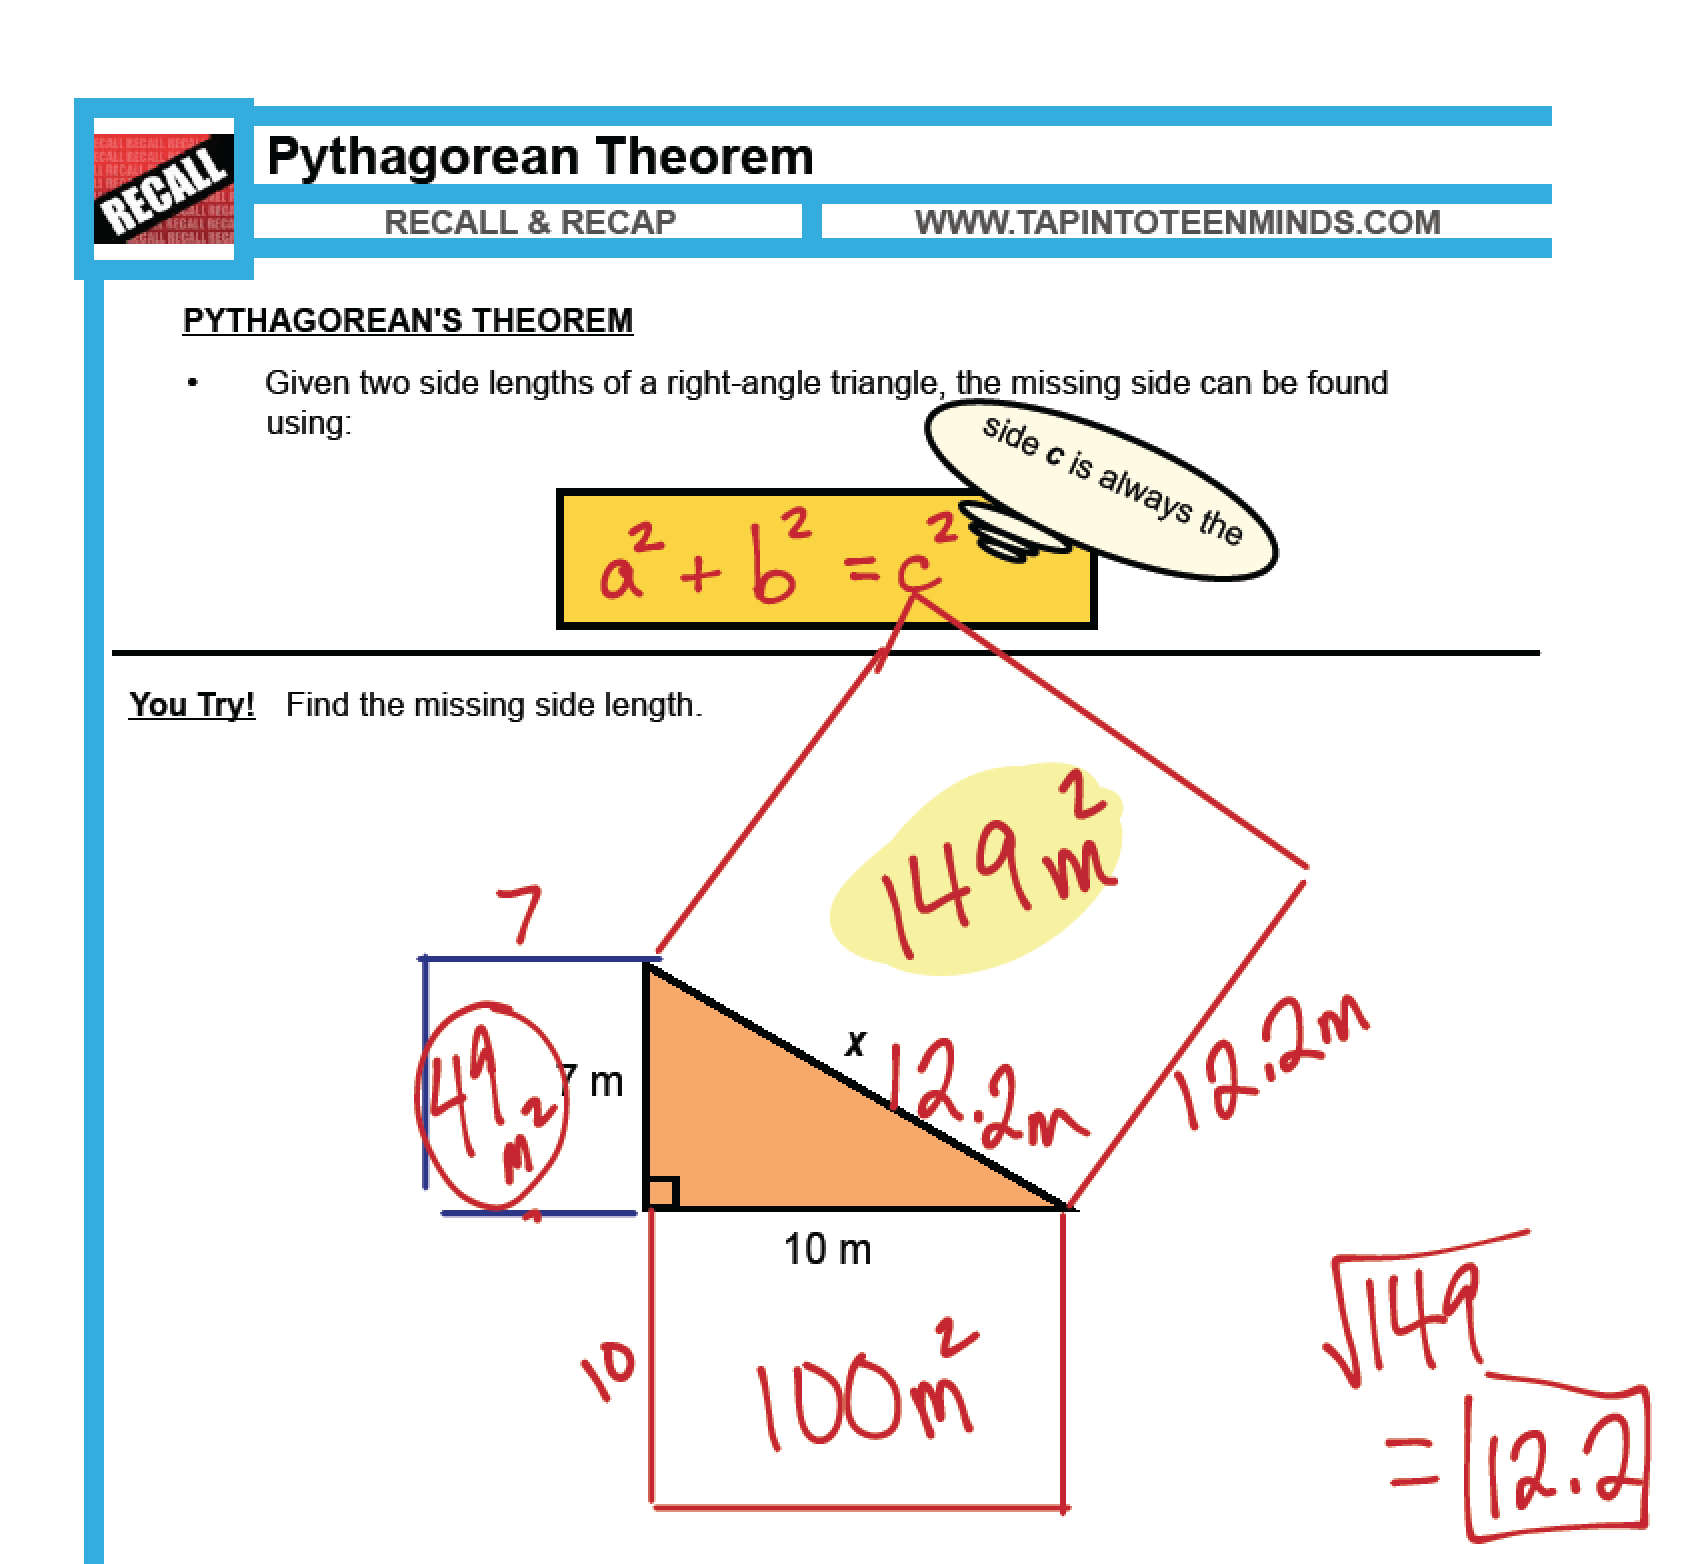 Worksheet Three Digit Word Problems Wosenly Free Worksheet – Pythagorean Theorem Word Problems Worksheet